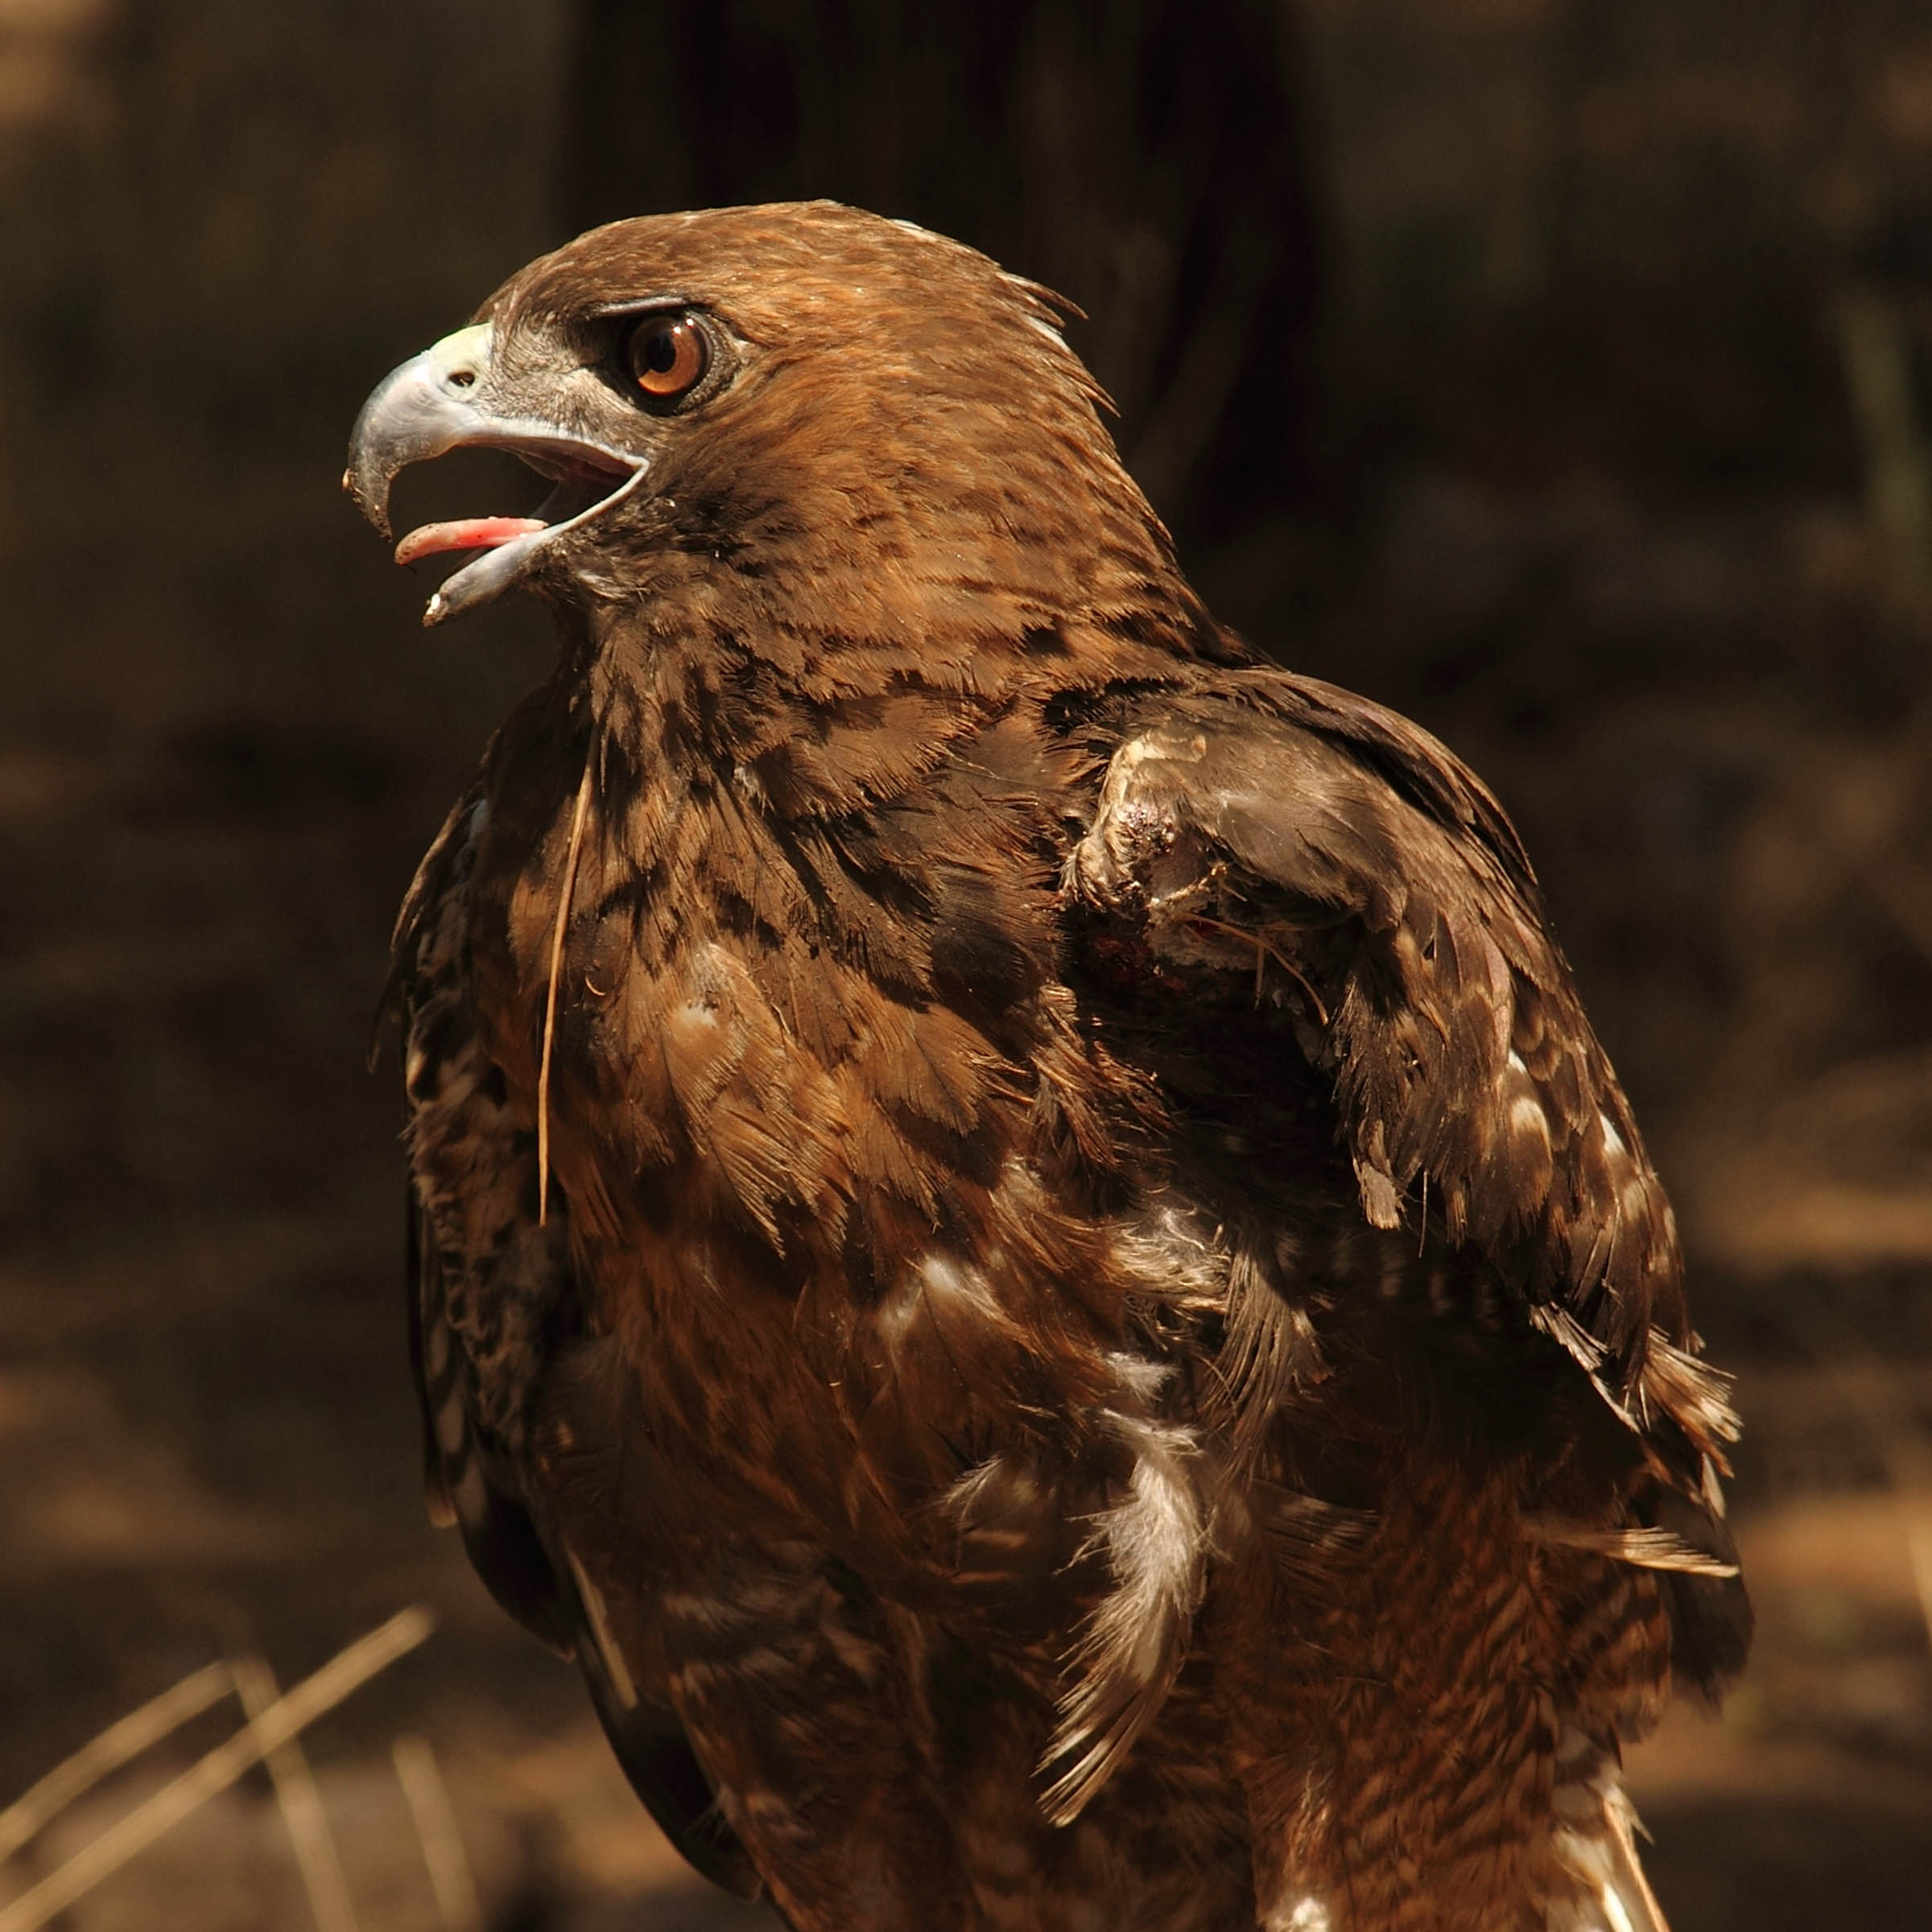 Sonja - Red Tailed Hawk (Buteo jamaicensis)